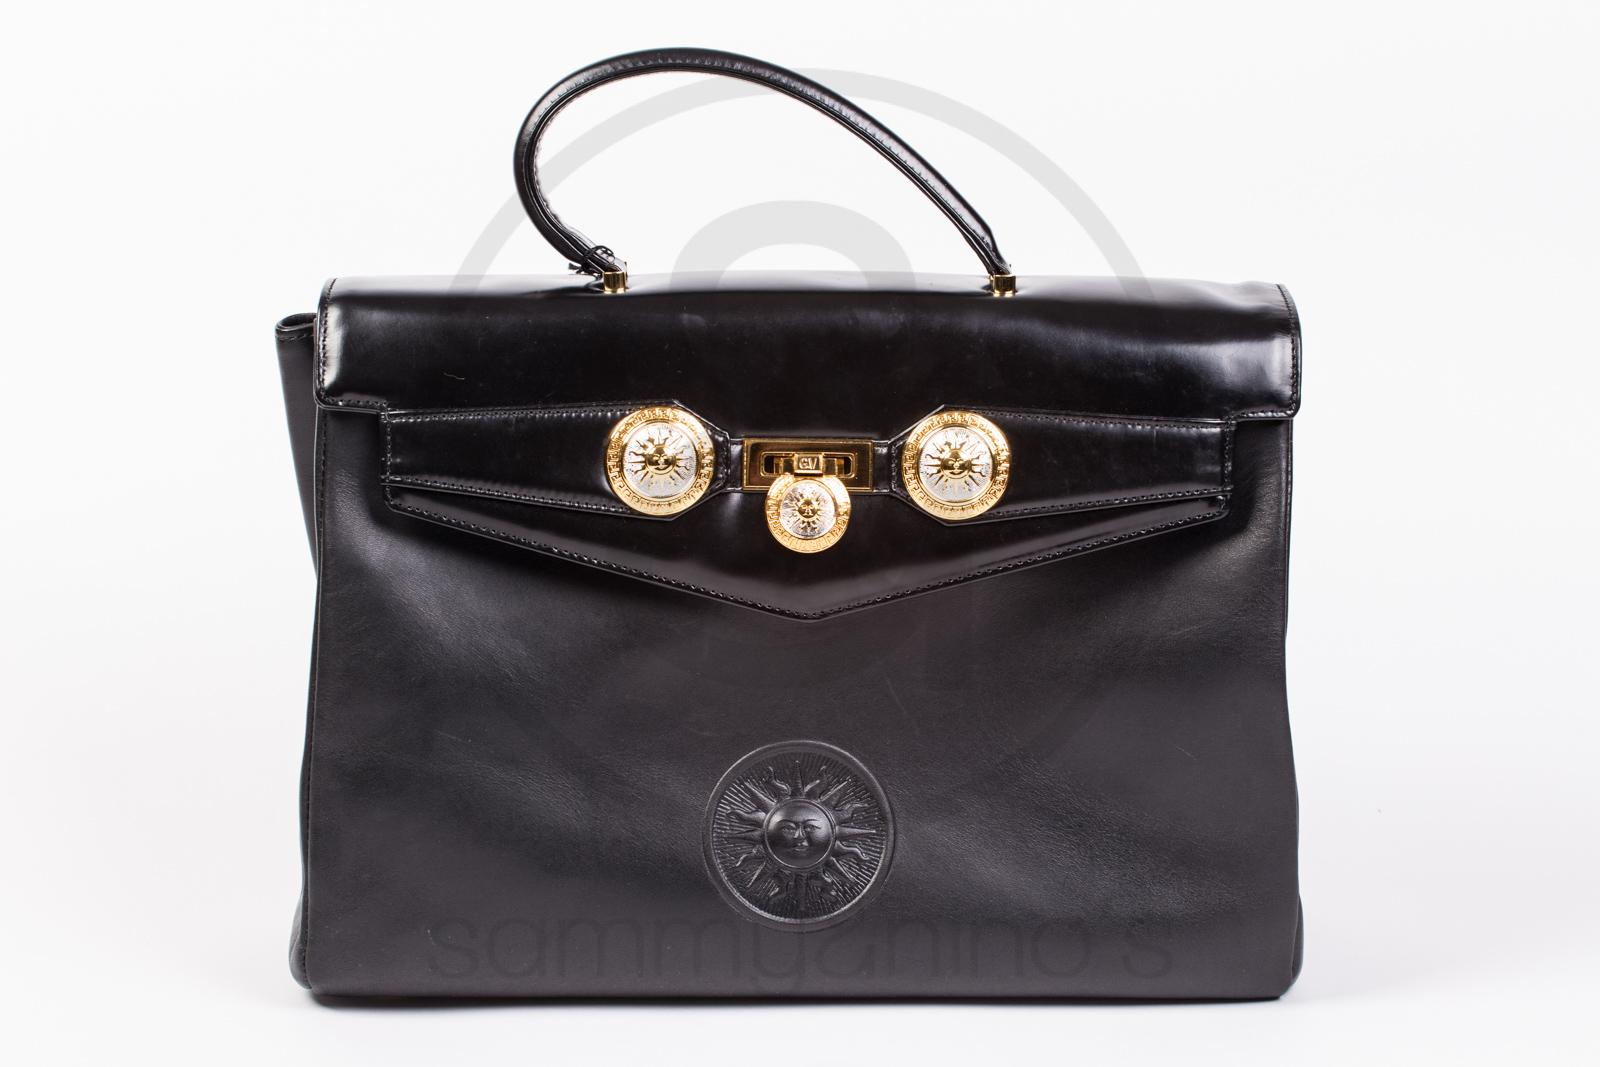 7bba0b74dd00 Gianni Versace leather purse bag large – Sammy   Nino s Store